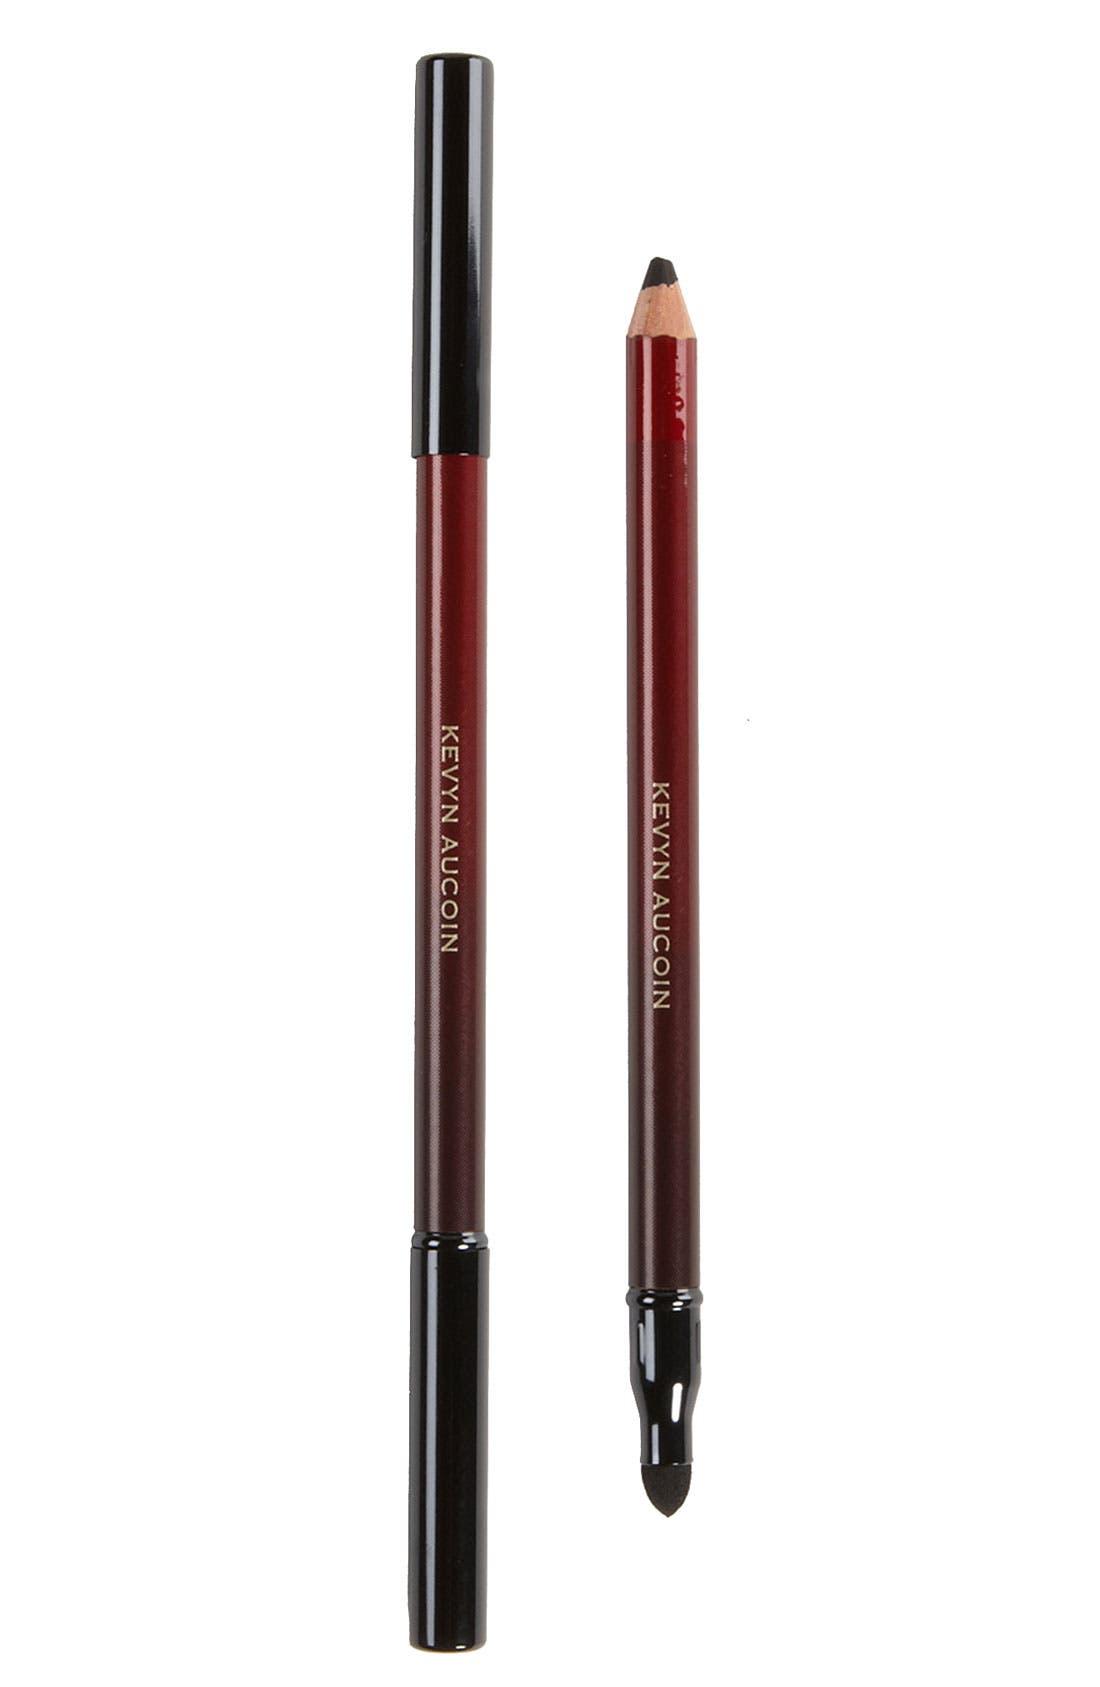 SPACE.NK.apothecary Kevyn Aucoin Beauty The Eye Pencil Primatif Pencil Eyeliner,                         Main,                         color, BASIC BLACK